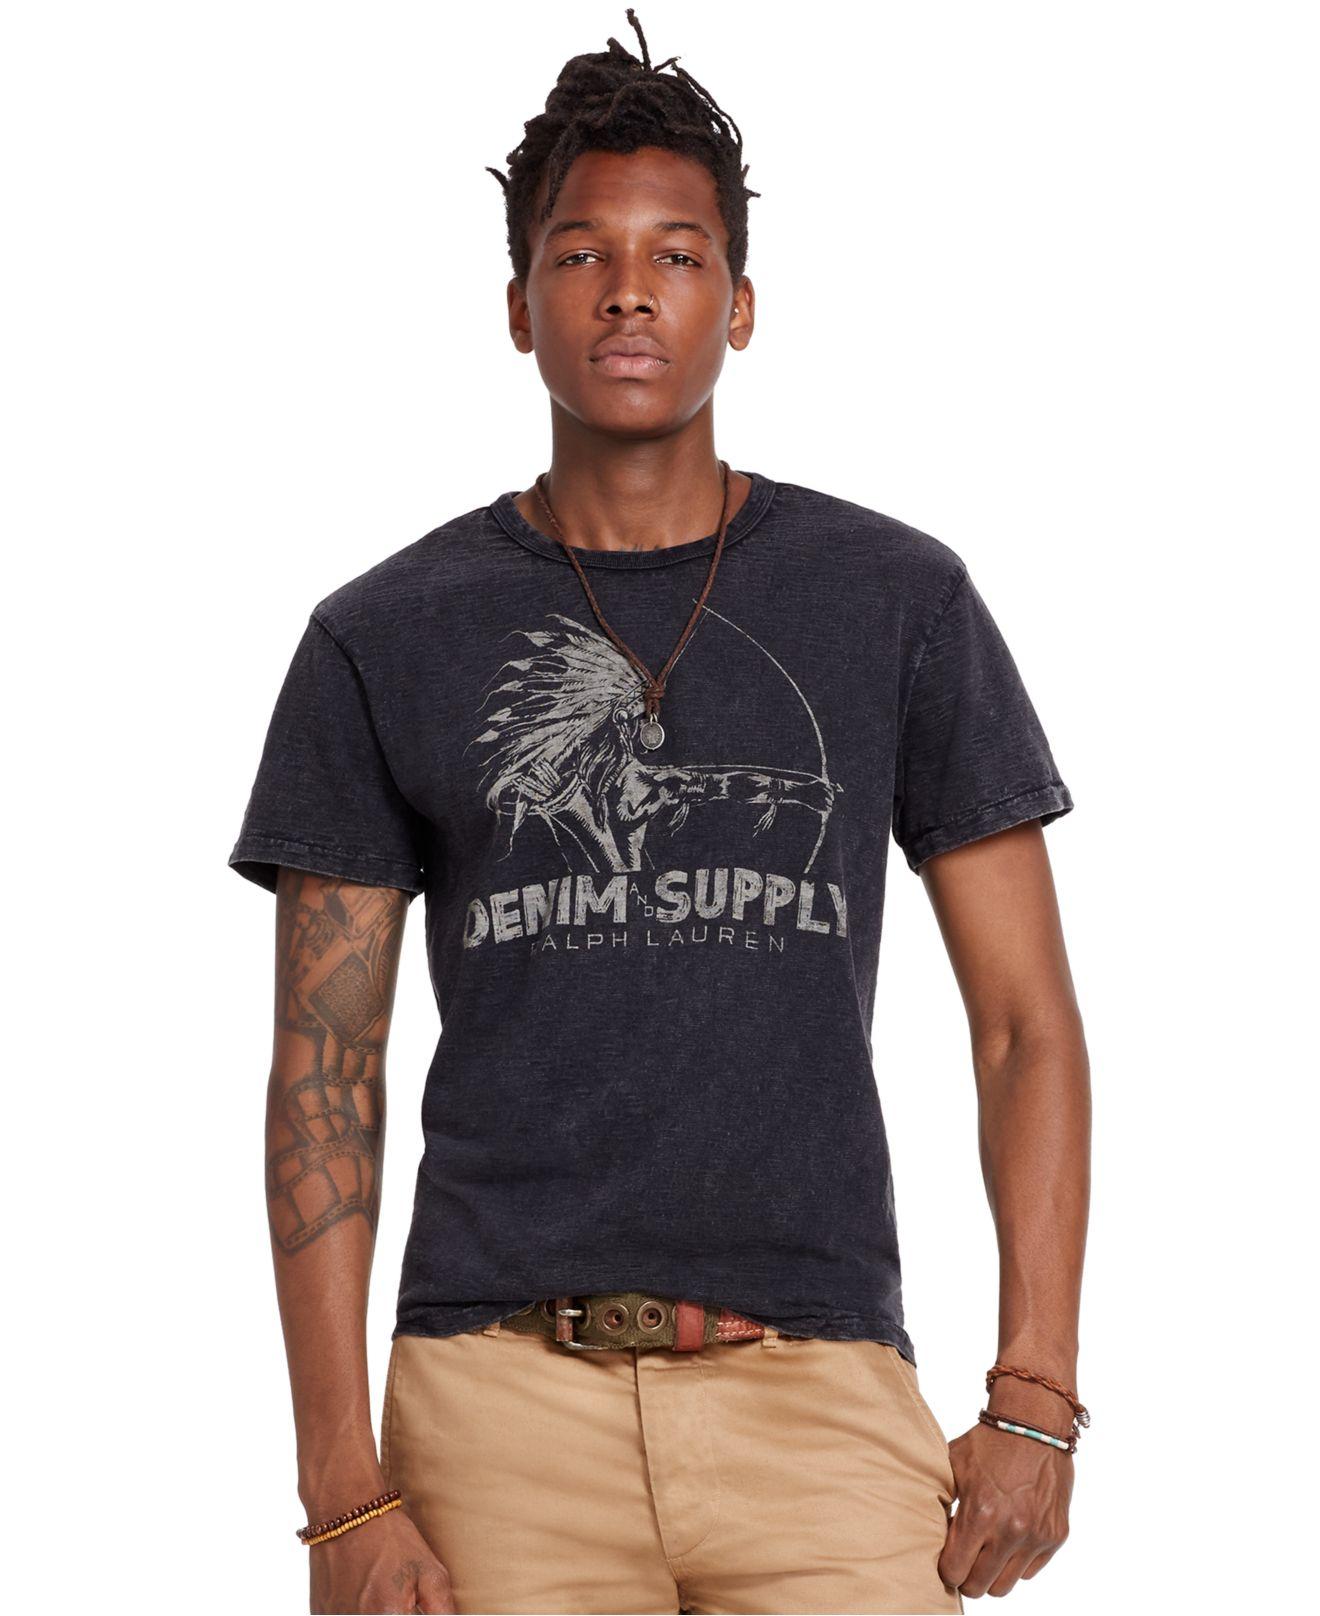 32519eca11e9a6 Lyst - Denim   Supply Ralph Lauren Slub Cotton Jersey Graphic Tee in ...